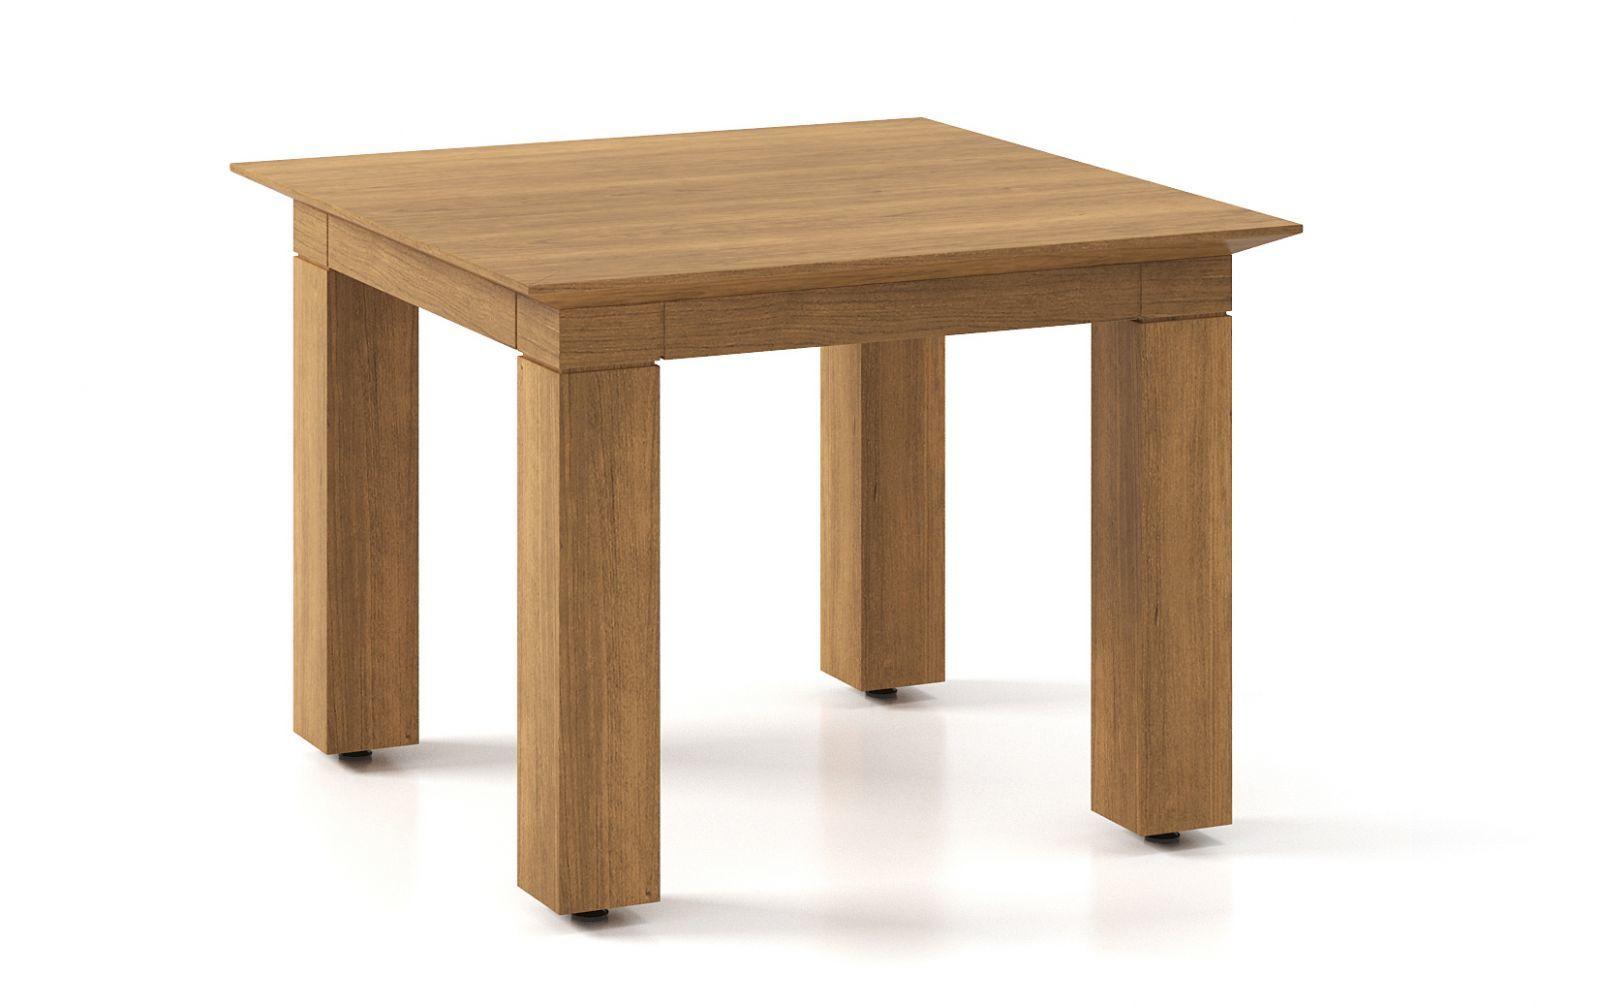 Flint Office Furniture: Flint 001